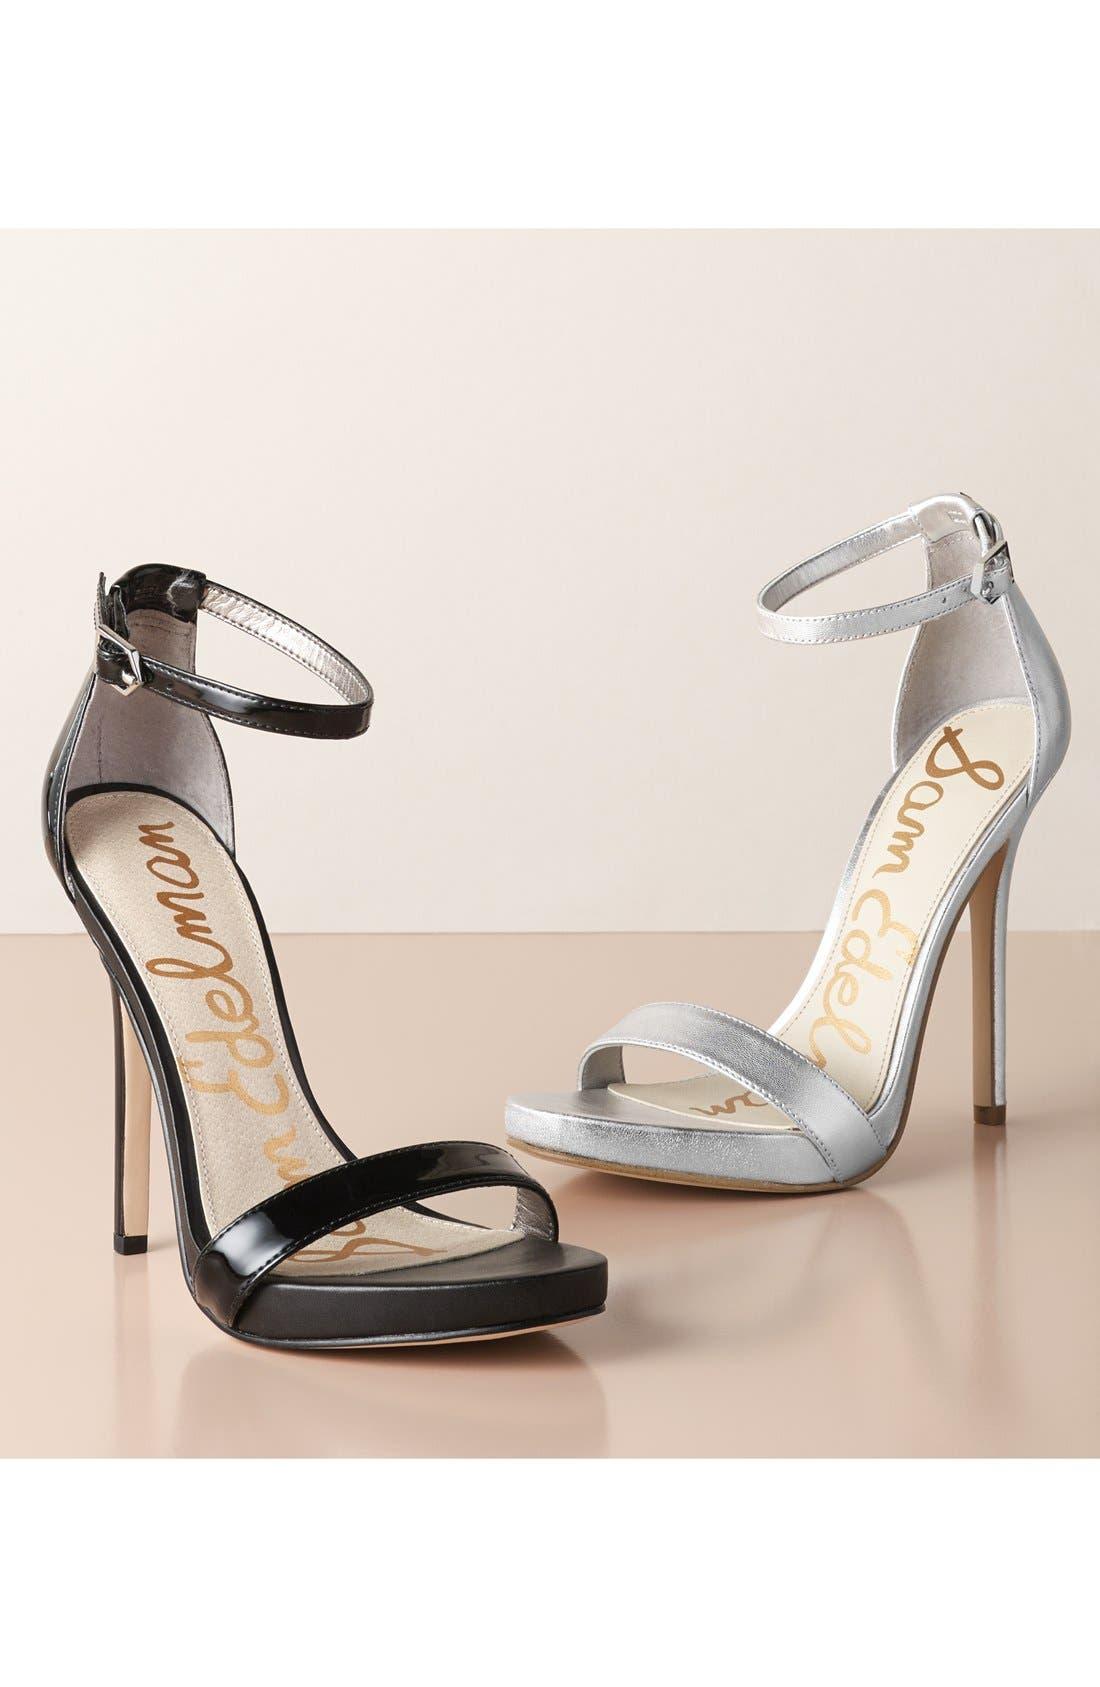 'Eleanor' Ankle Strap Sandal, Main, color, 400